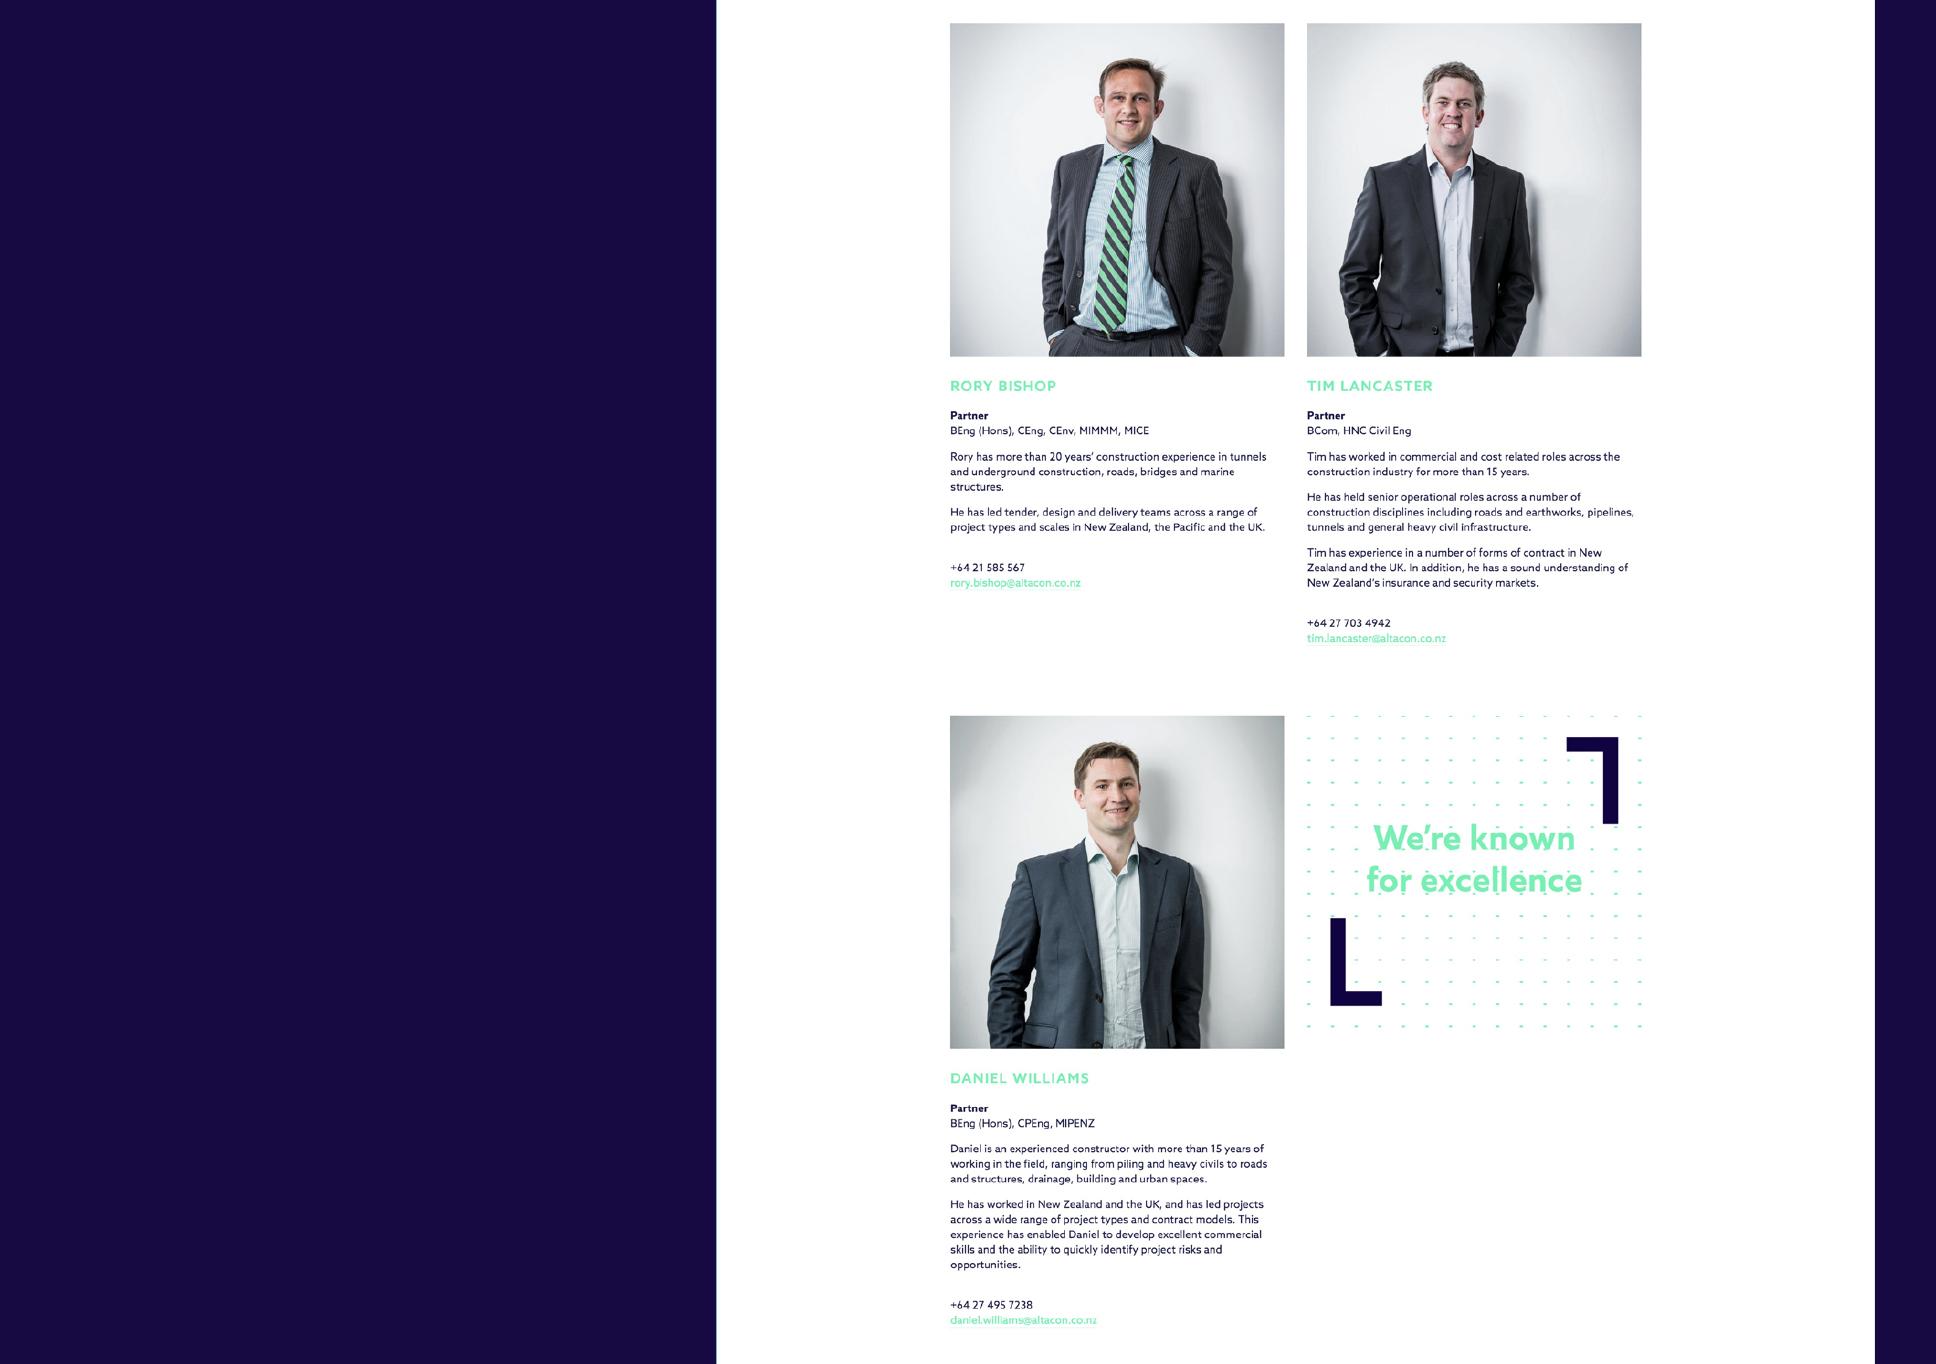 Alta team - Rory Bishop, Tim Lancaster, Daniel Williams